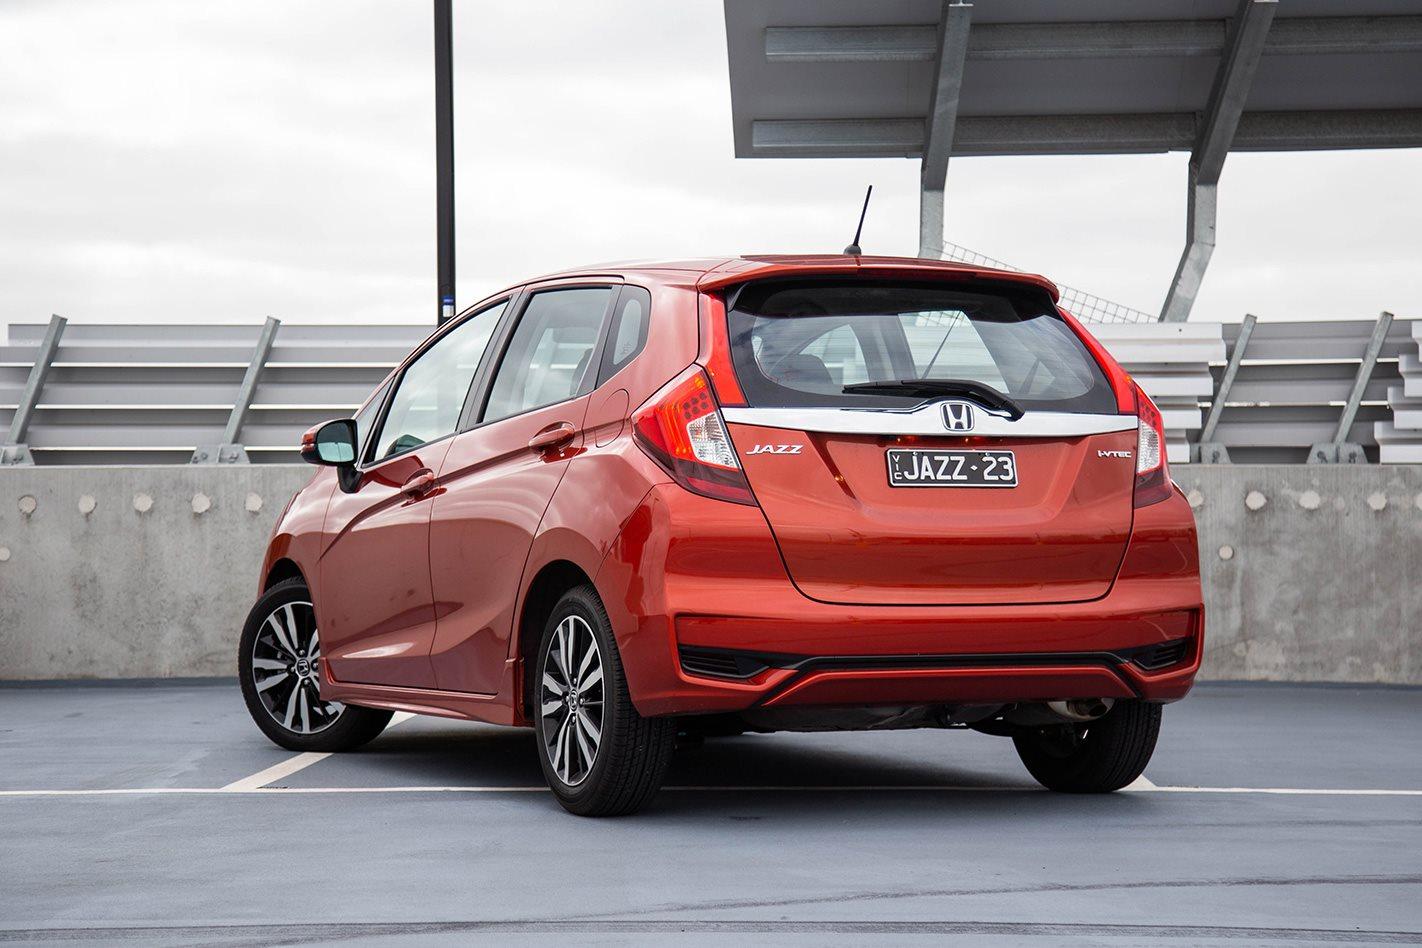 2019 Honda Jazz VTI-S quick review